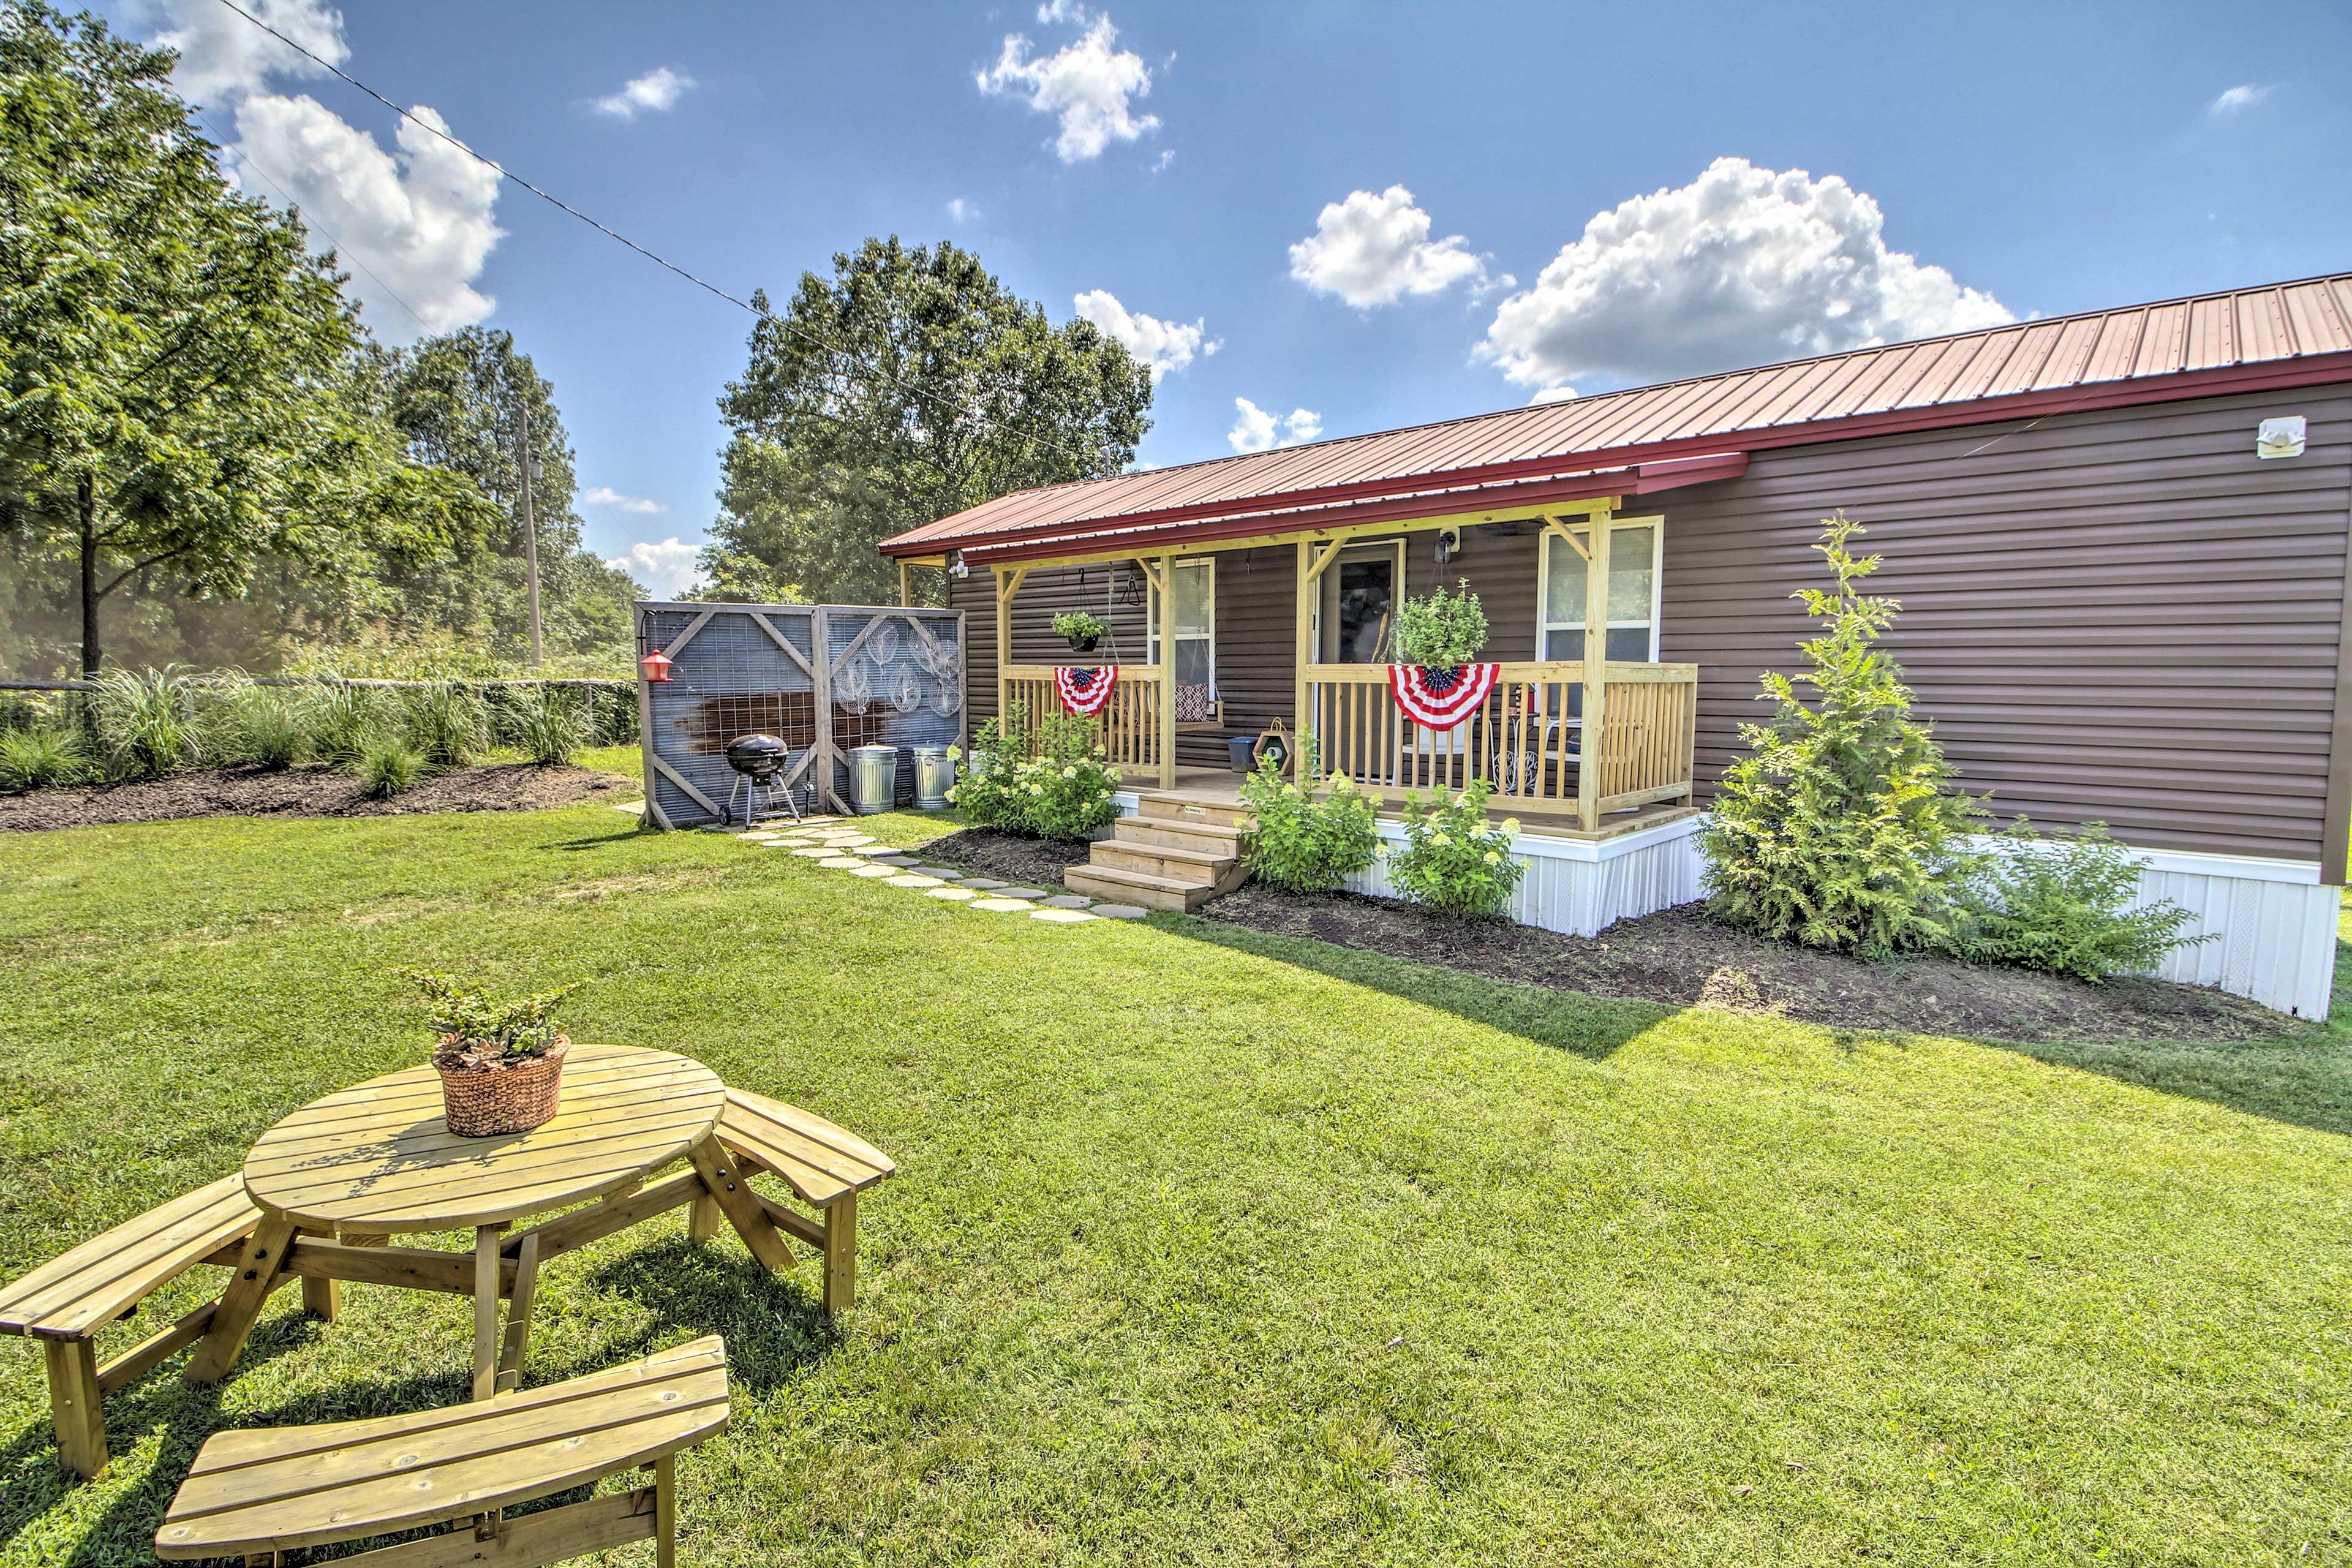 'Valley View Cabin' boasts 1 bedroom and 1 bathroom.